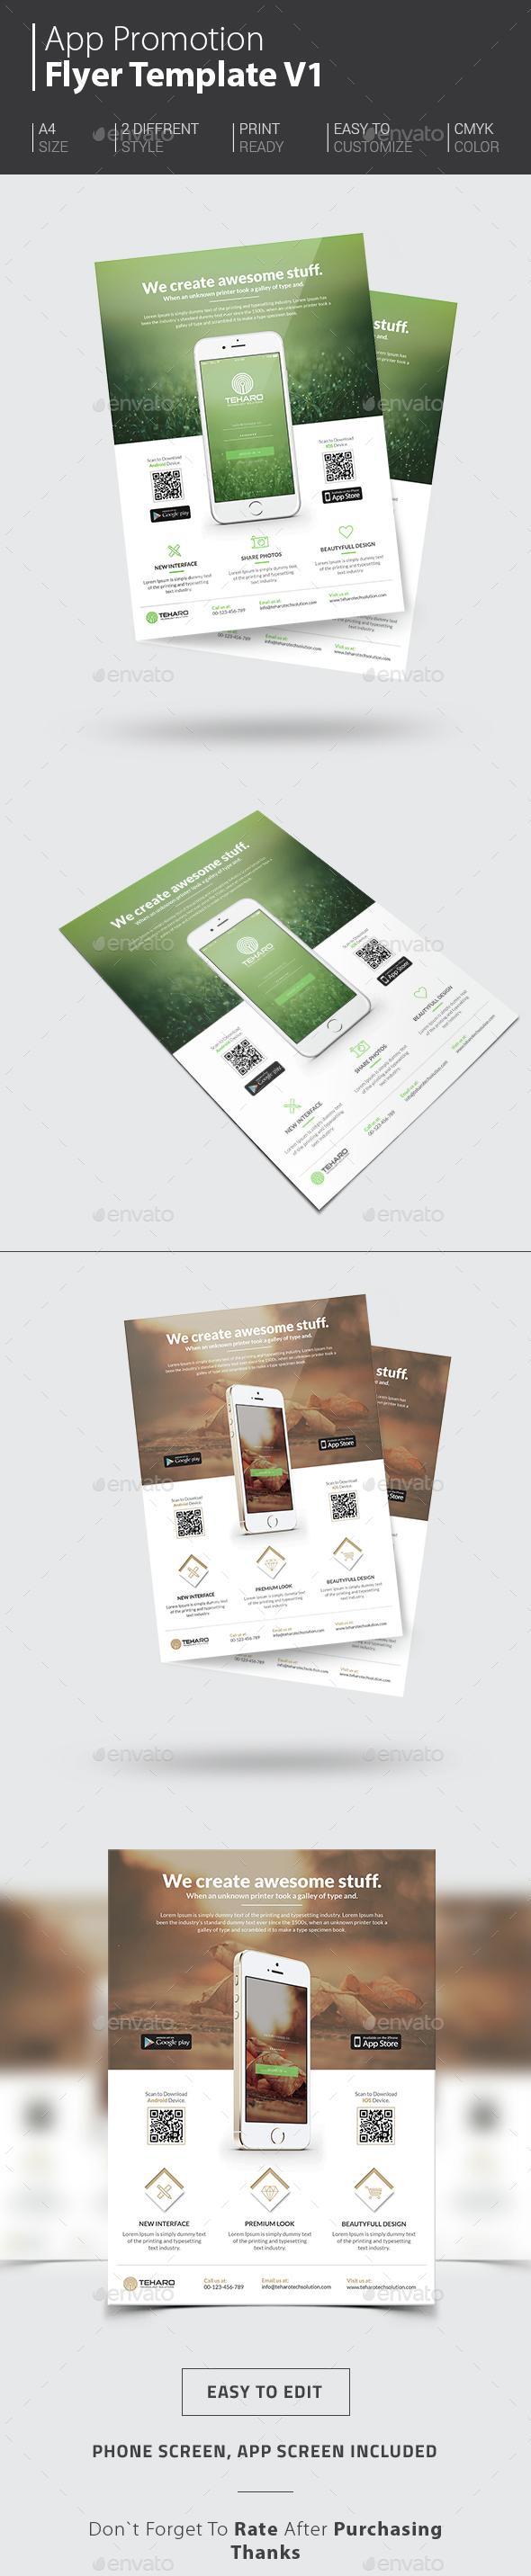 App Promotion Flyer - Commerce Flyers